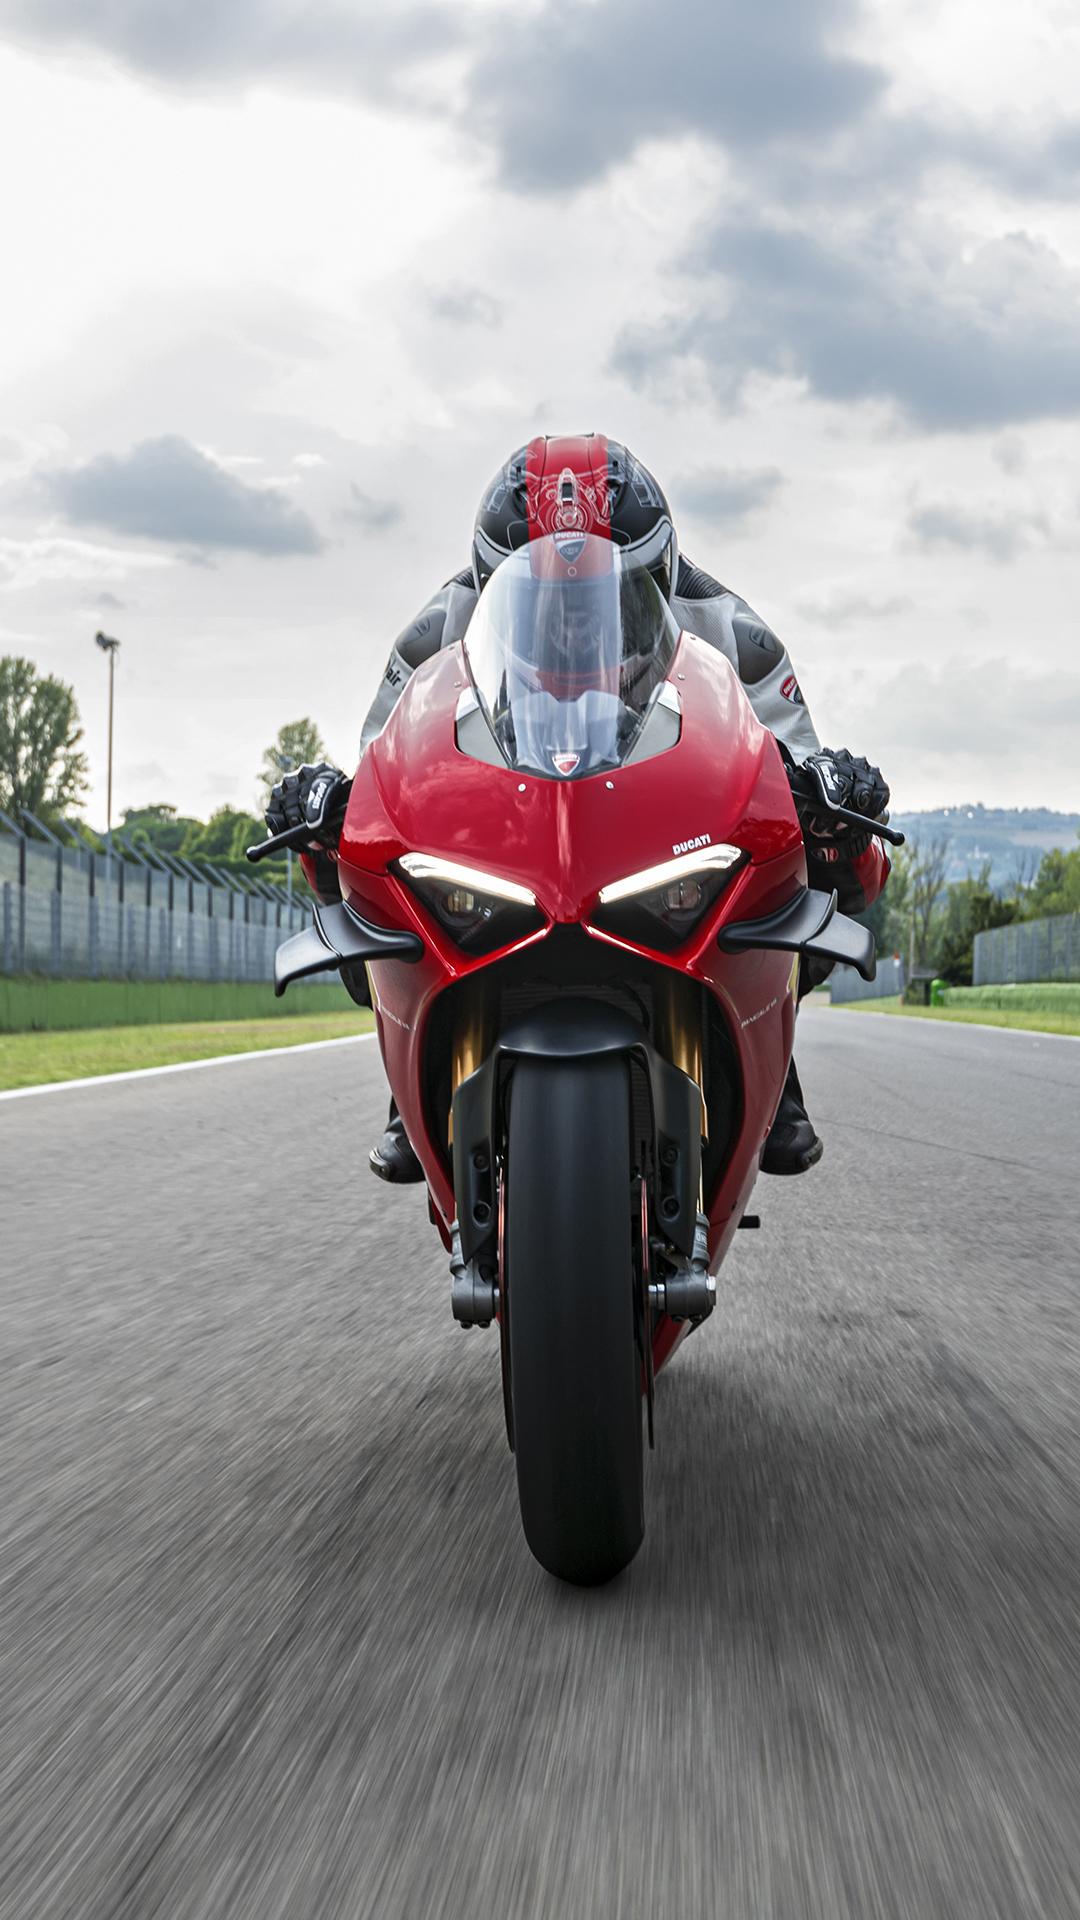 Product Release: Biketek Series 3 Garage Mats